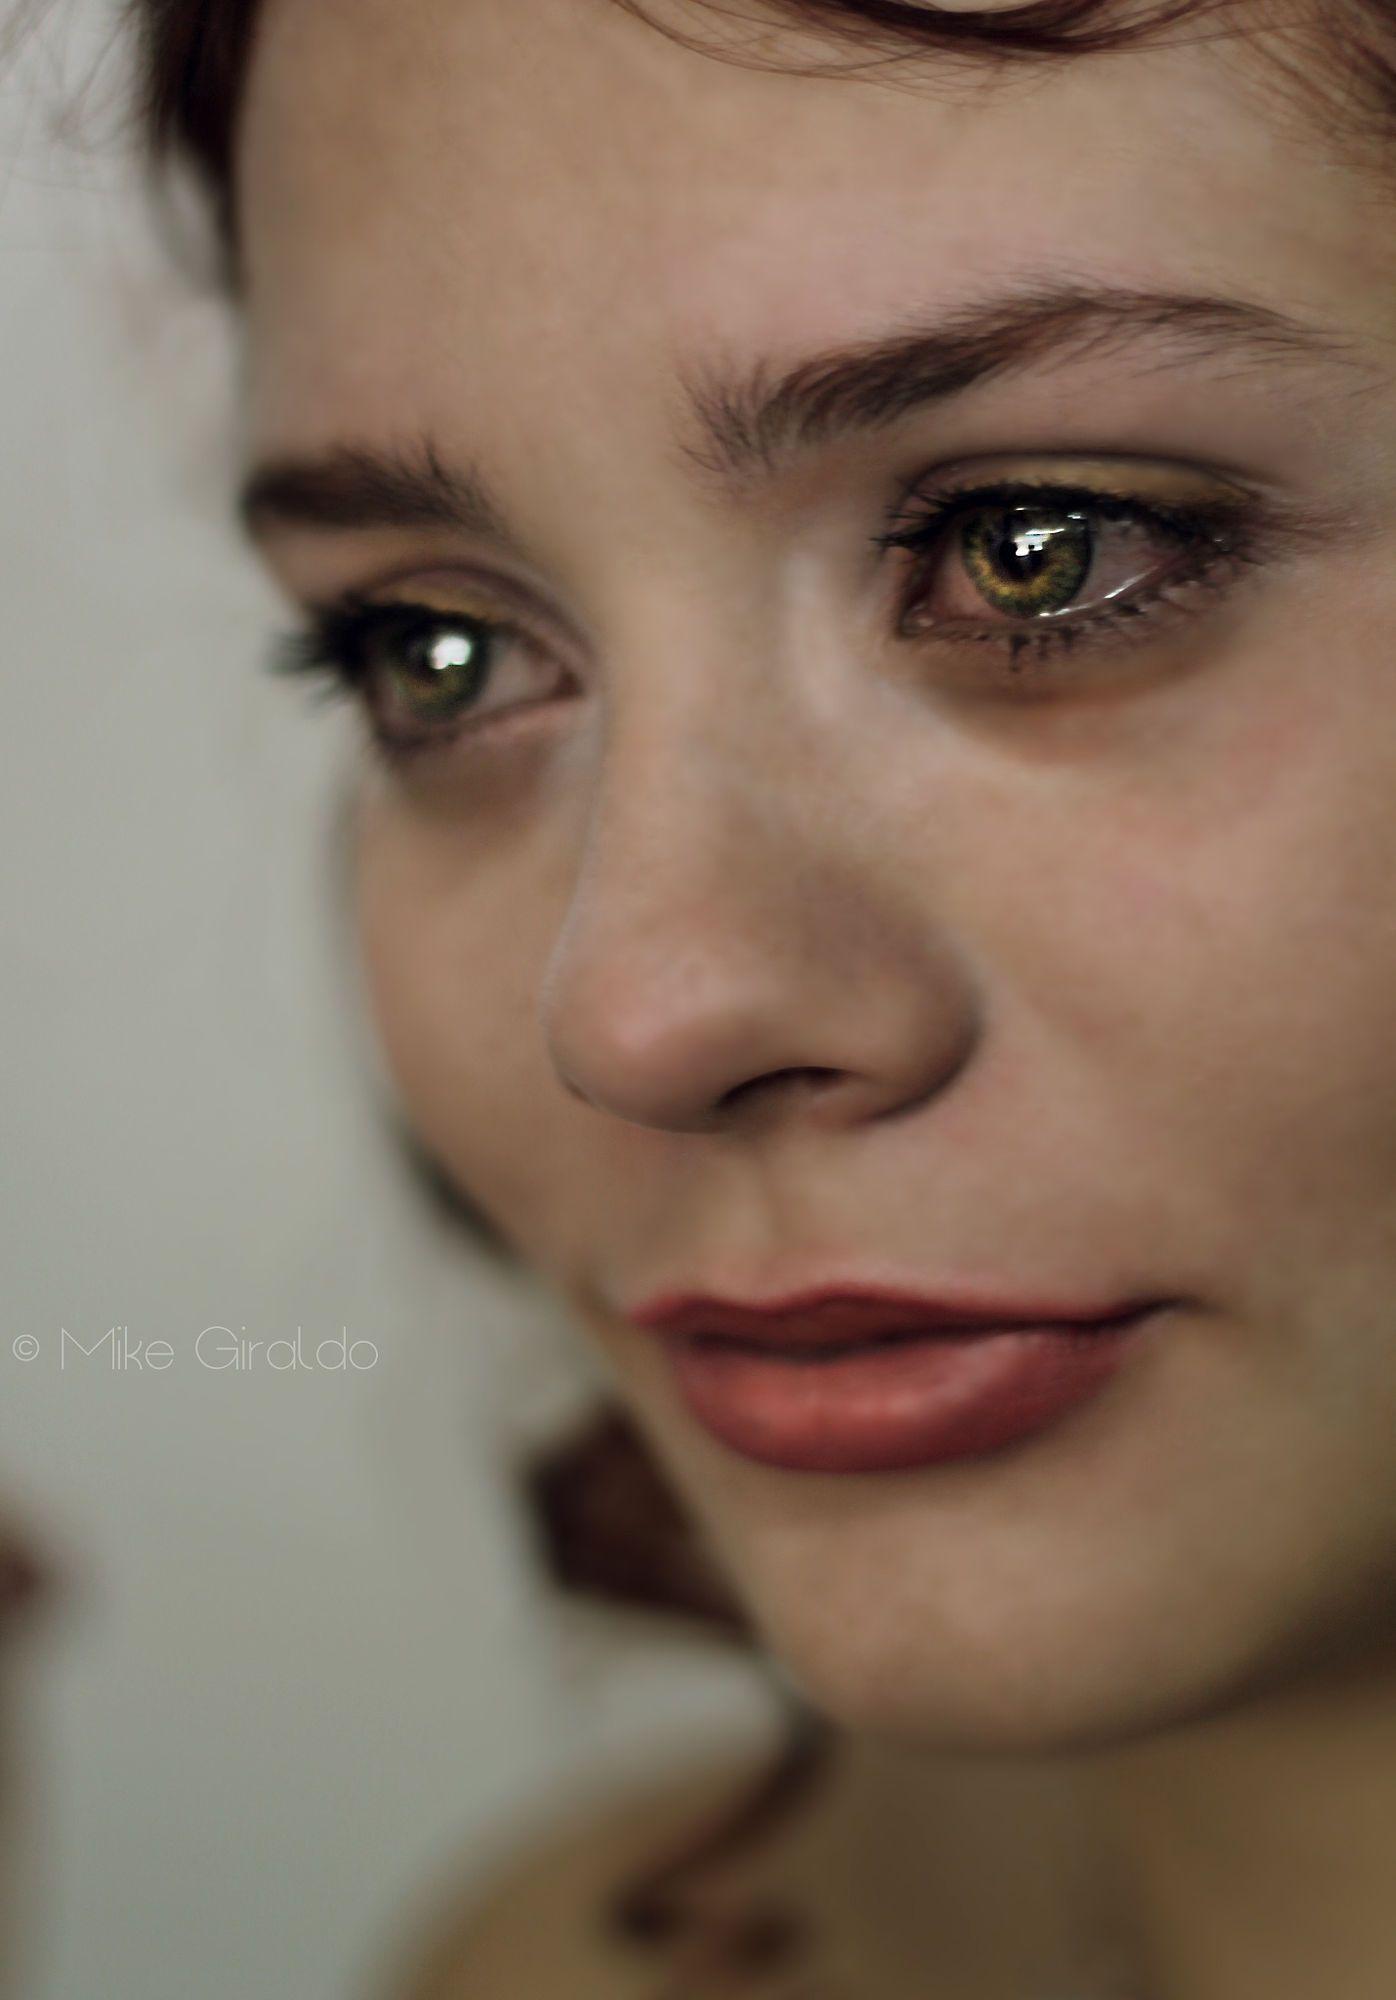 crymike giraldo | fashion | pinterest | crying, face and portraits